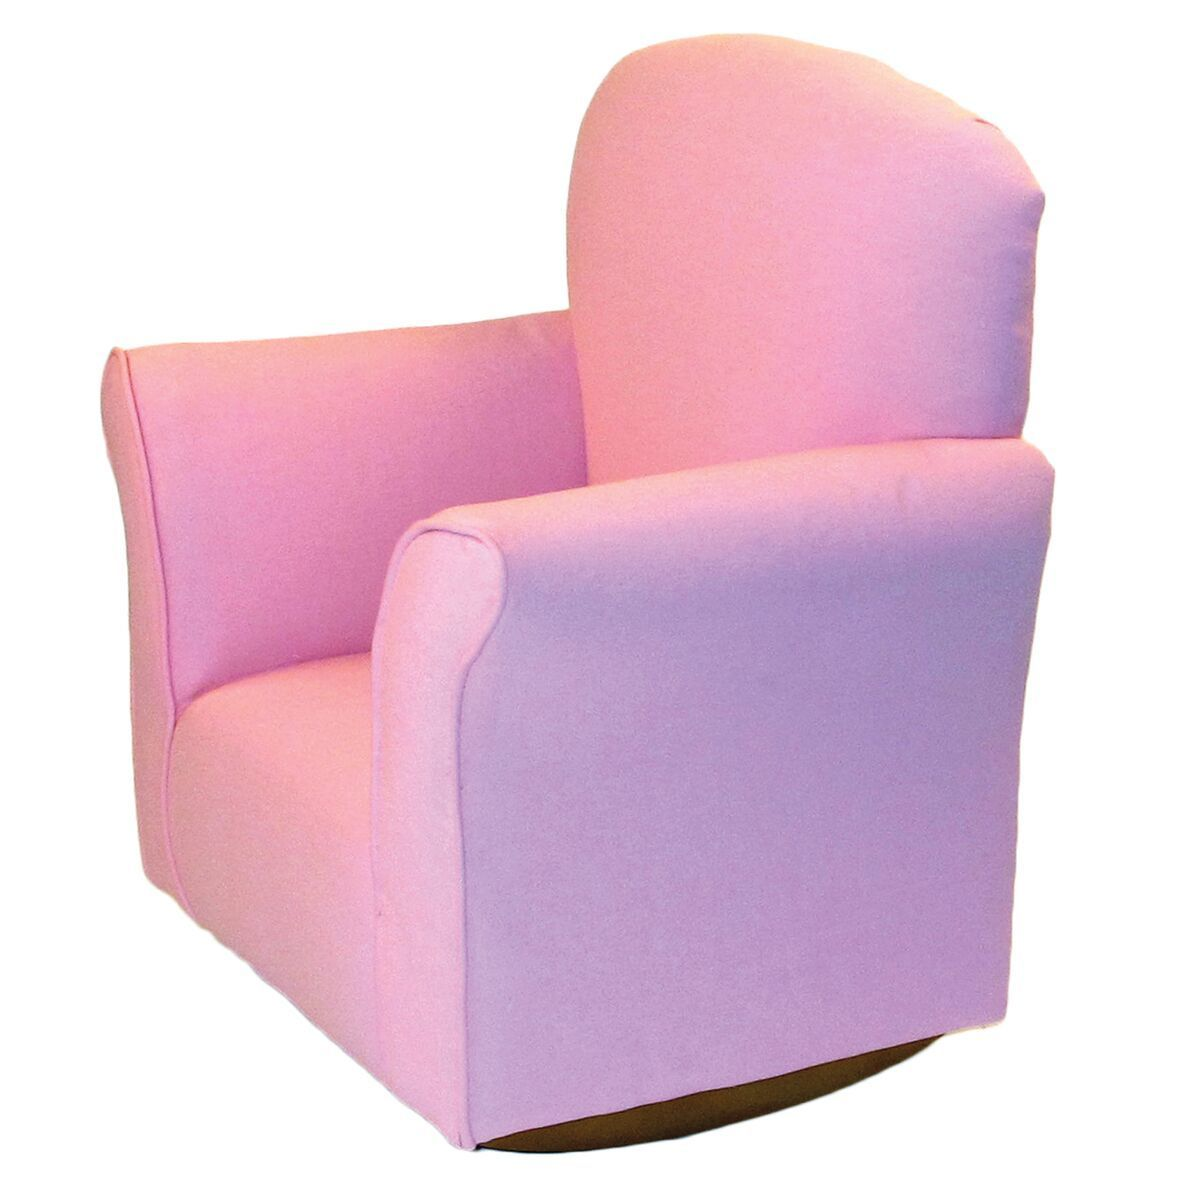 Shop Brighton Home Furniture Toddler Rocker in Cotton - Free ...